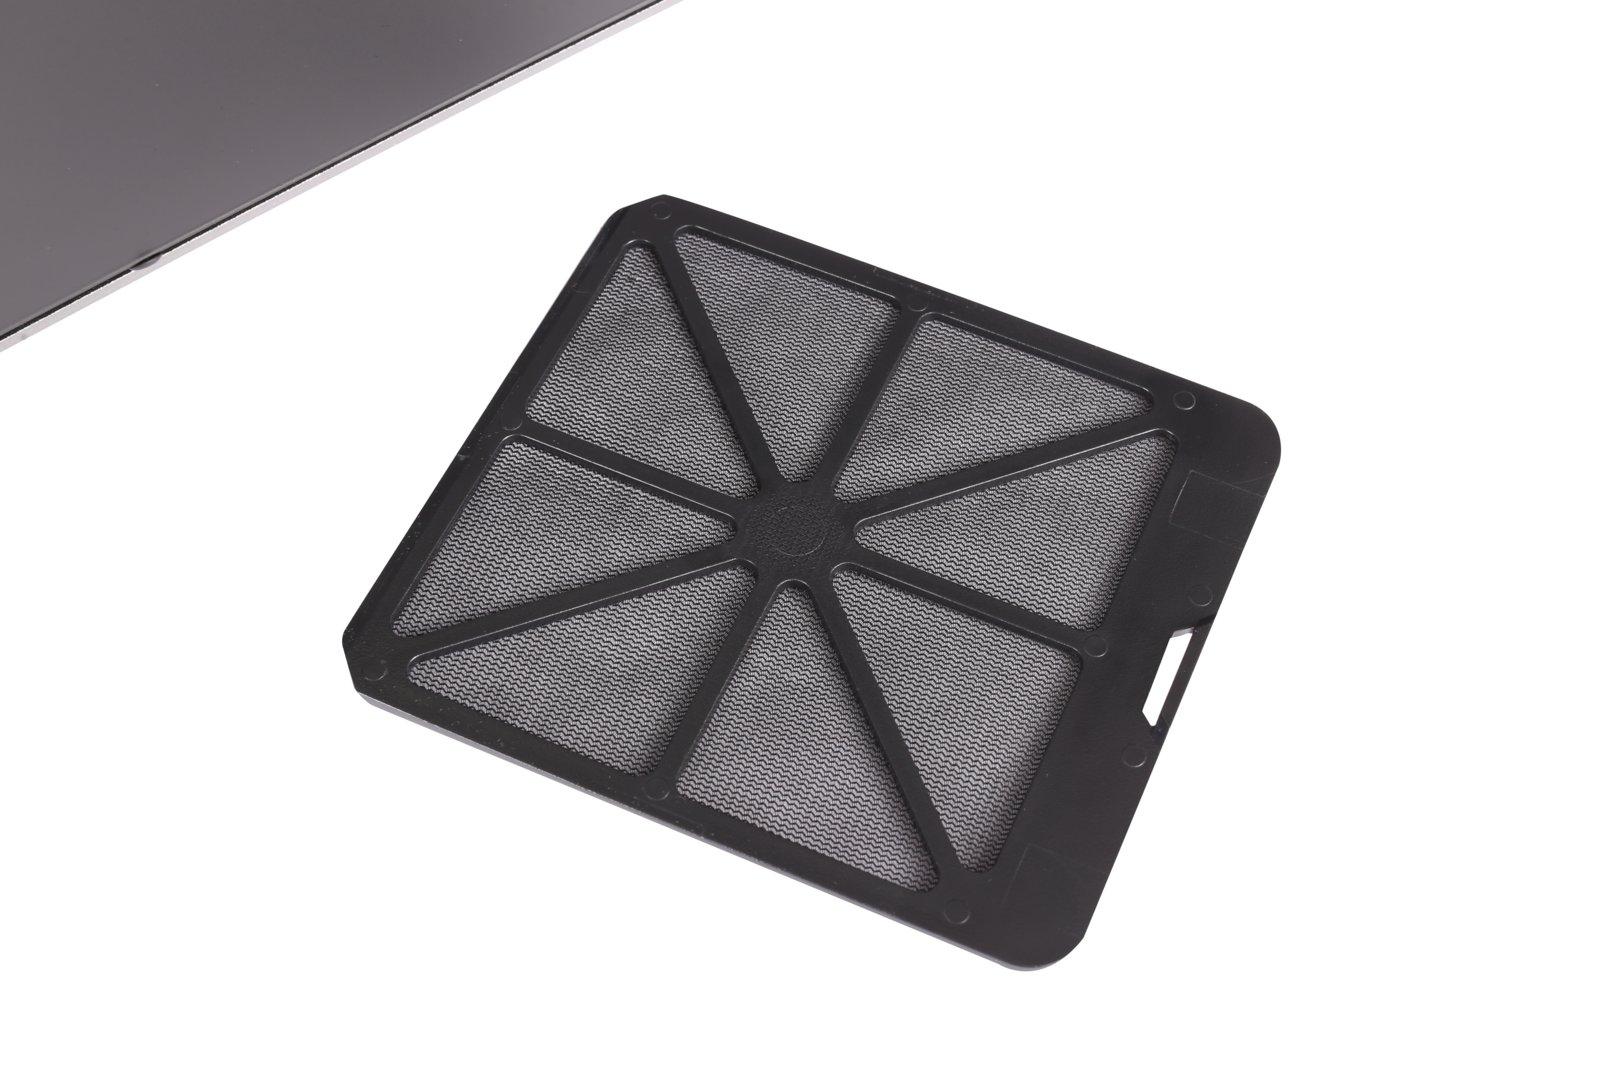 Antec Cube EK Water Blocks Edition